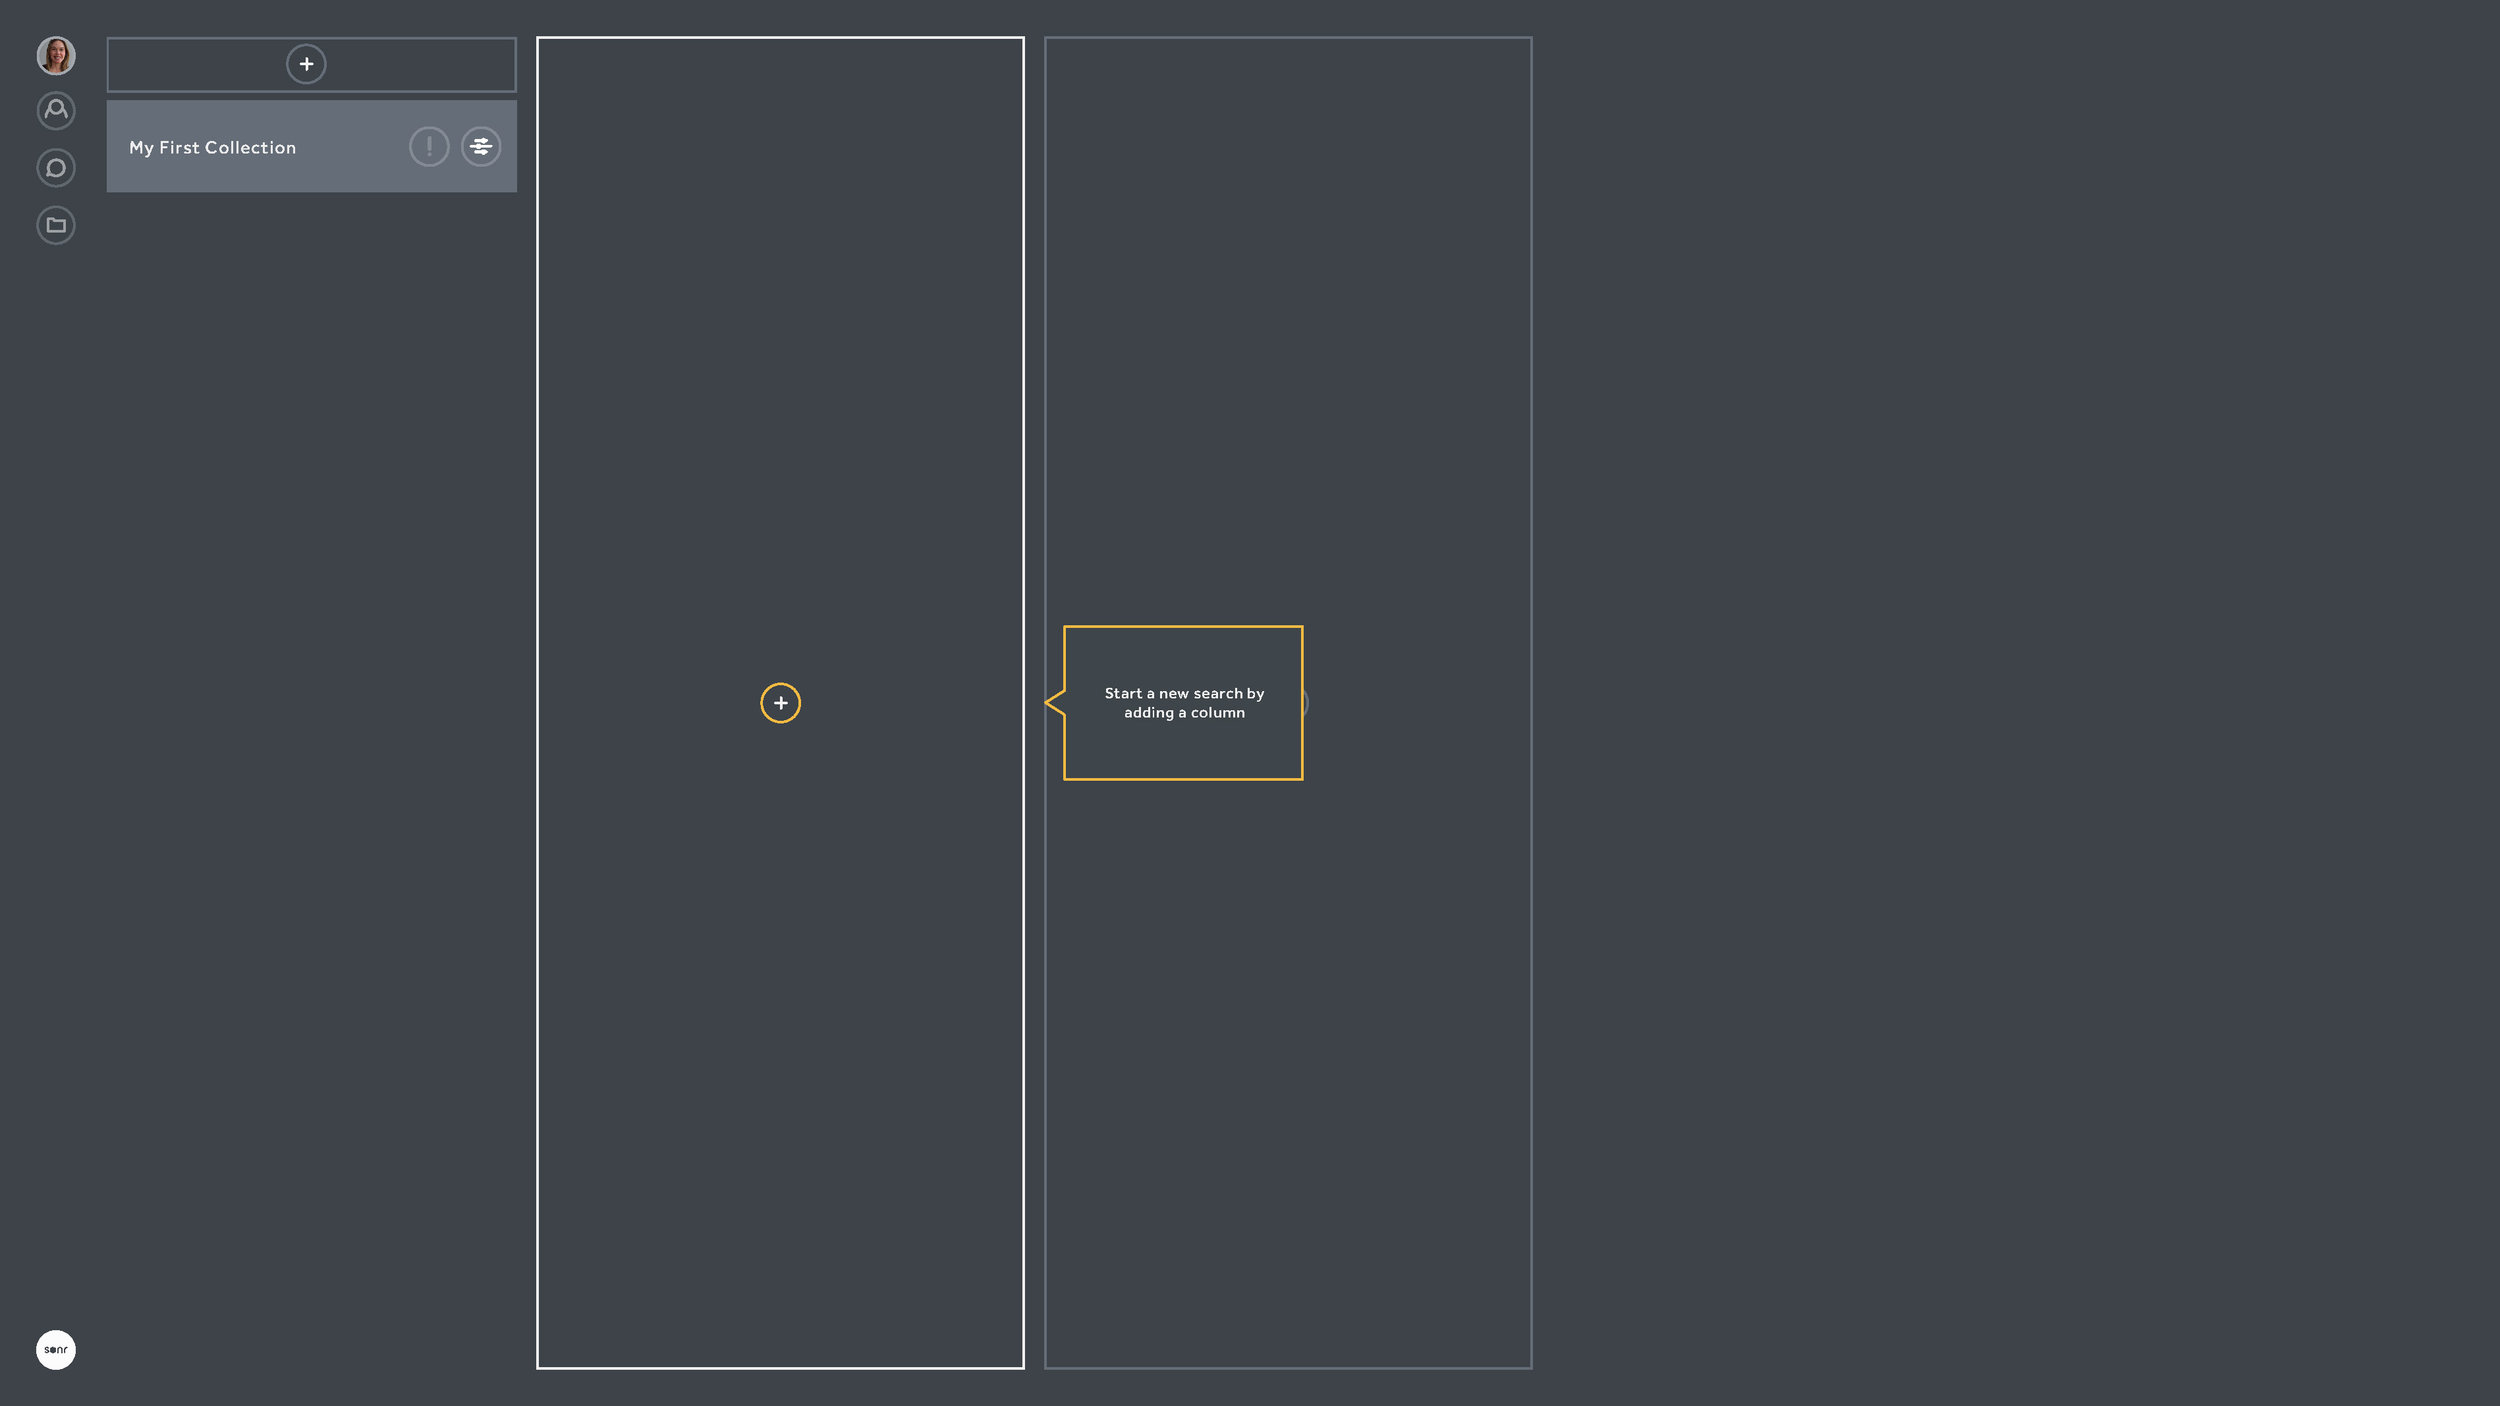 Sonr_Onboarding_Page_2.jpg